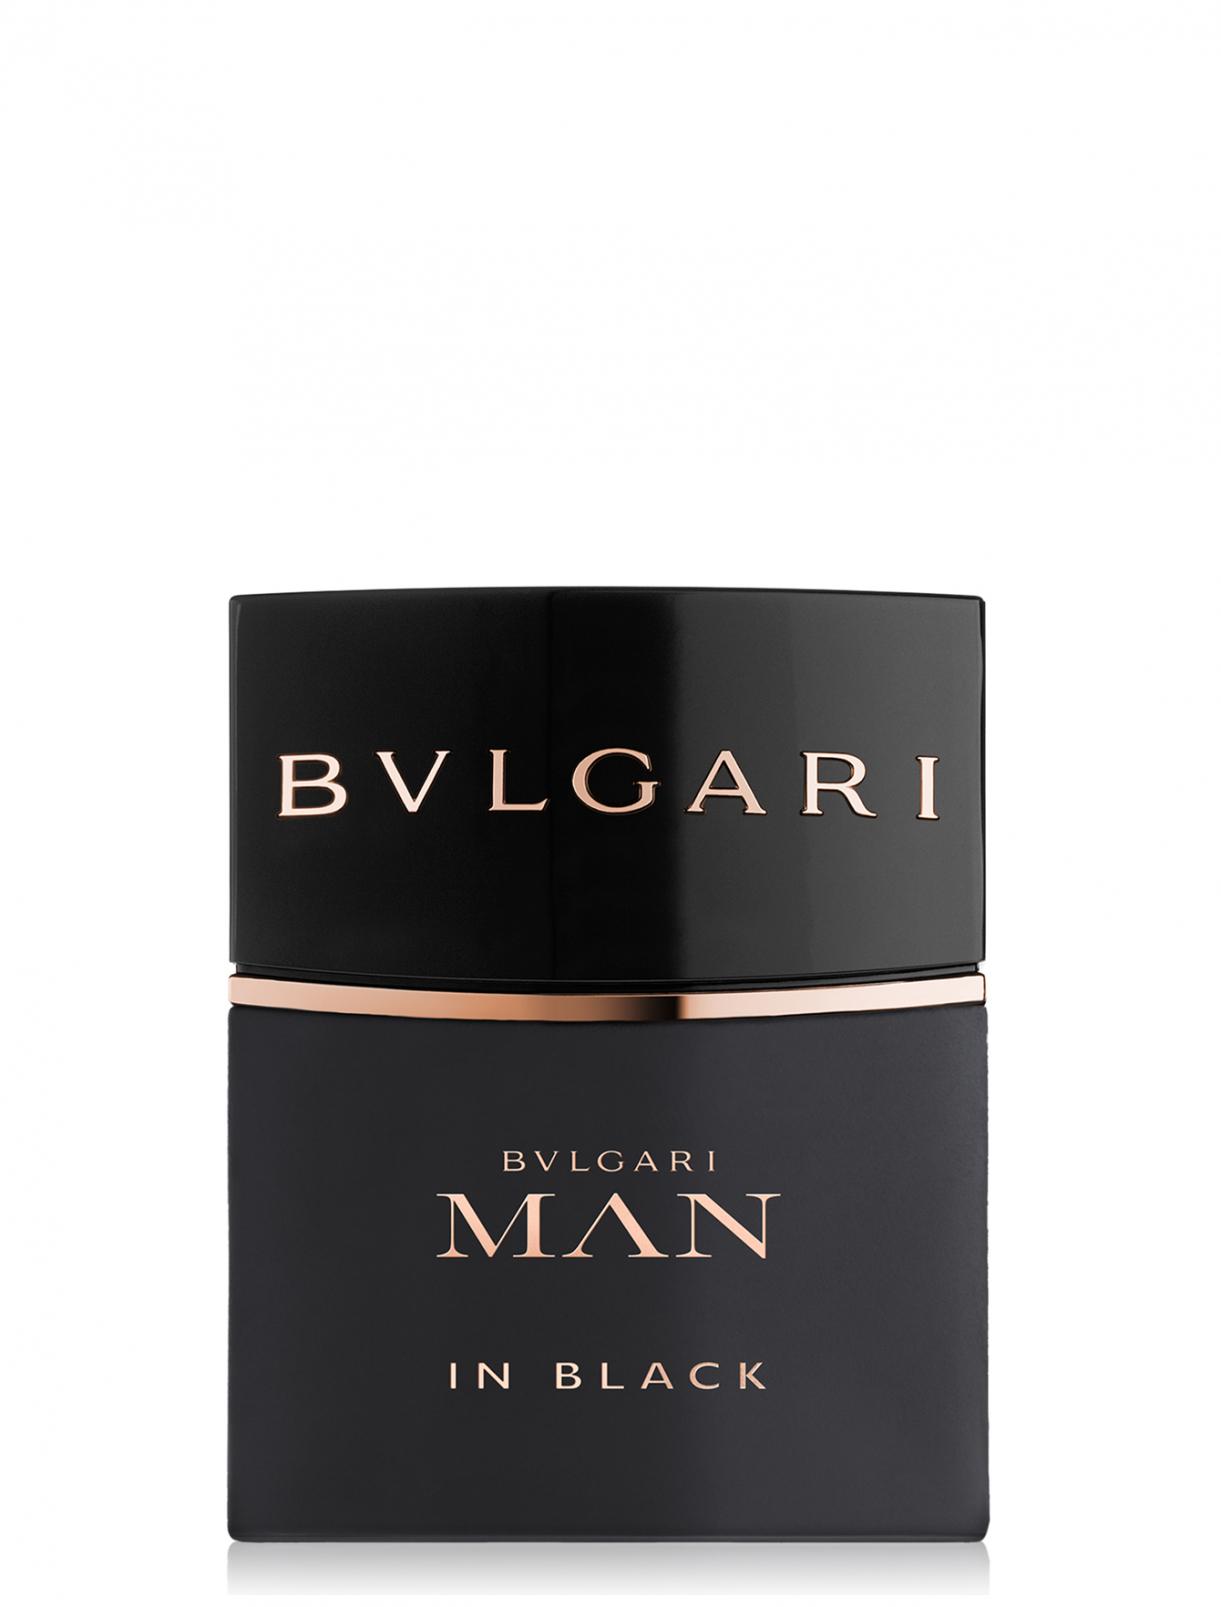 Парфюмерная вода 30 мл Man In Black BVLGARI  –  Общий вид